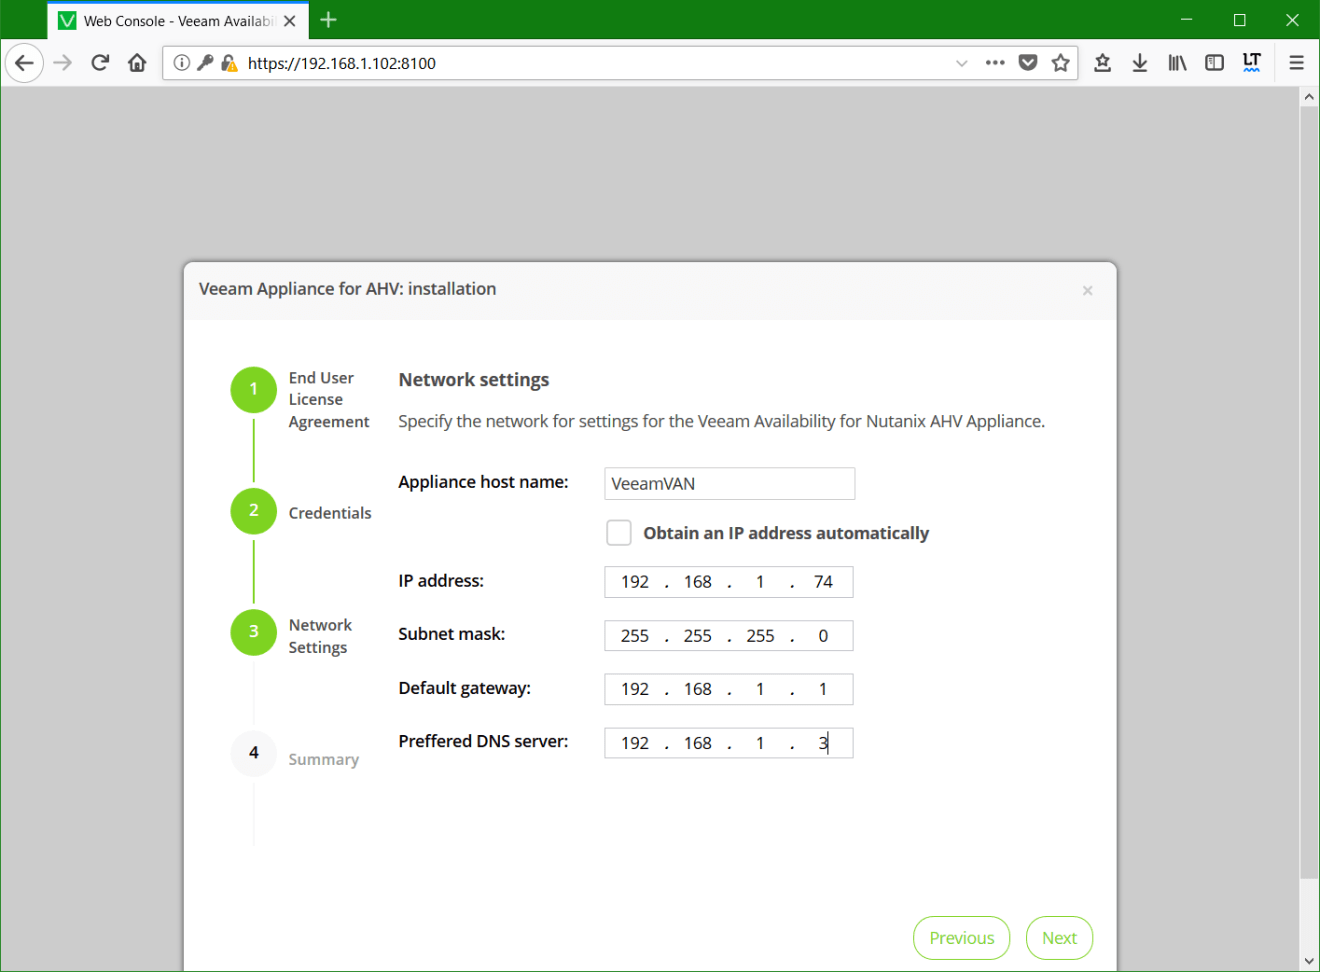 domalab.com Install Veeam VAN appliance networ settings